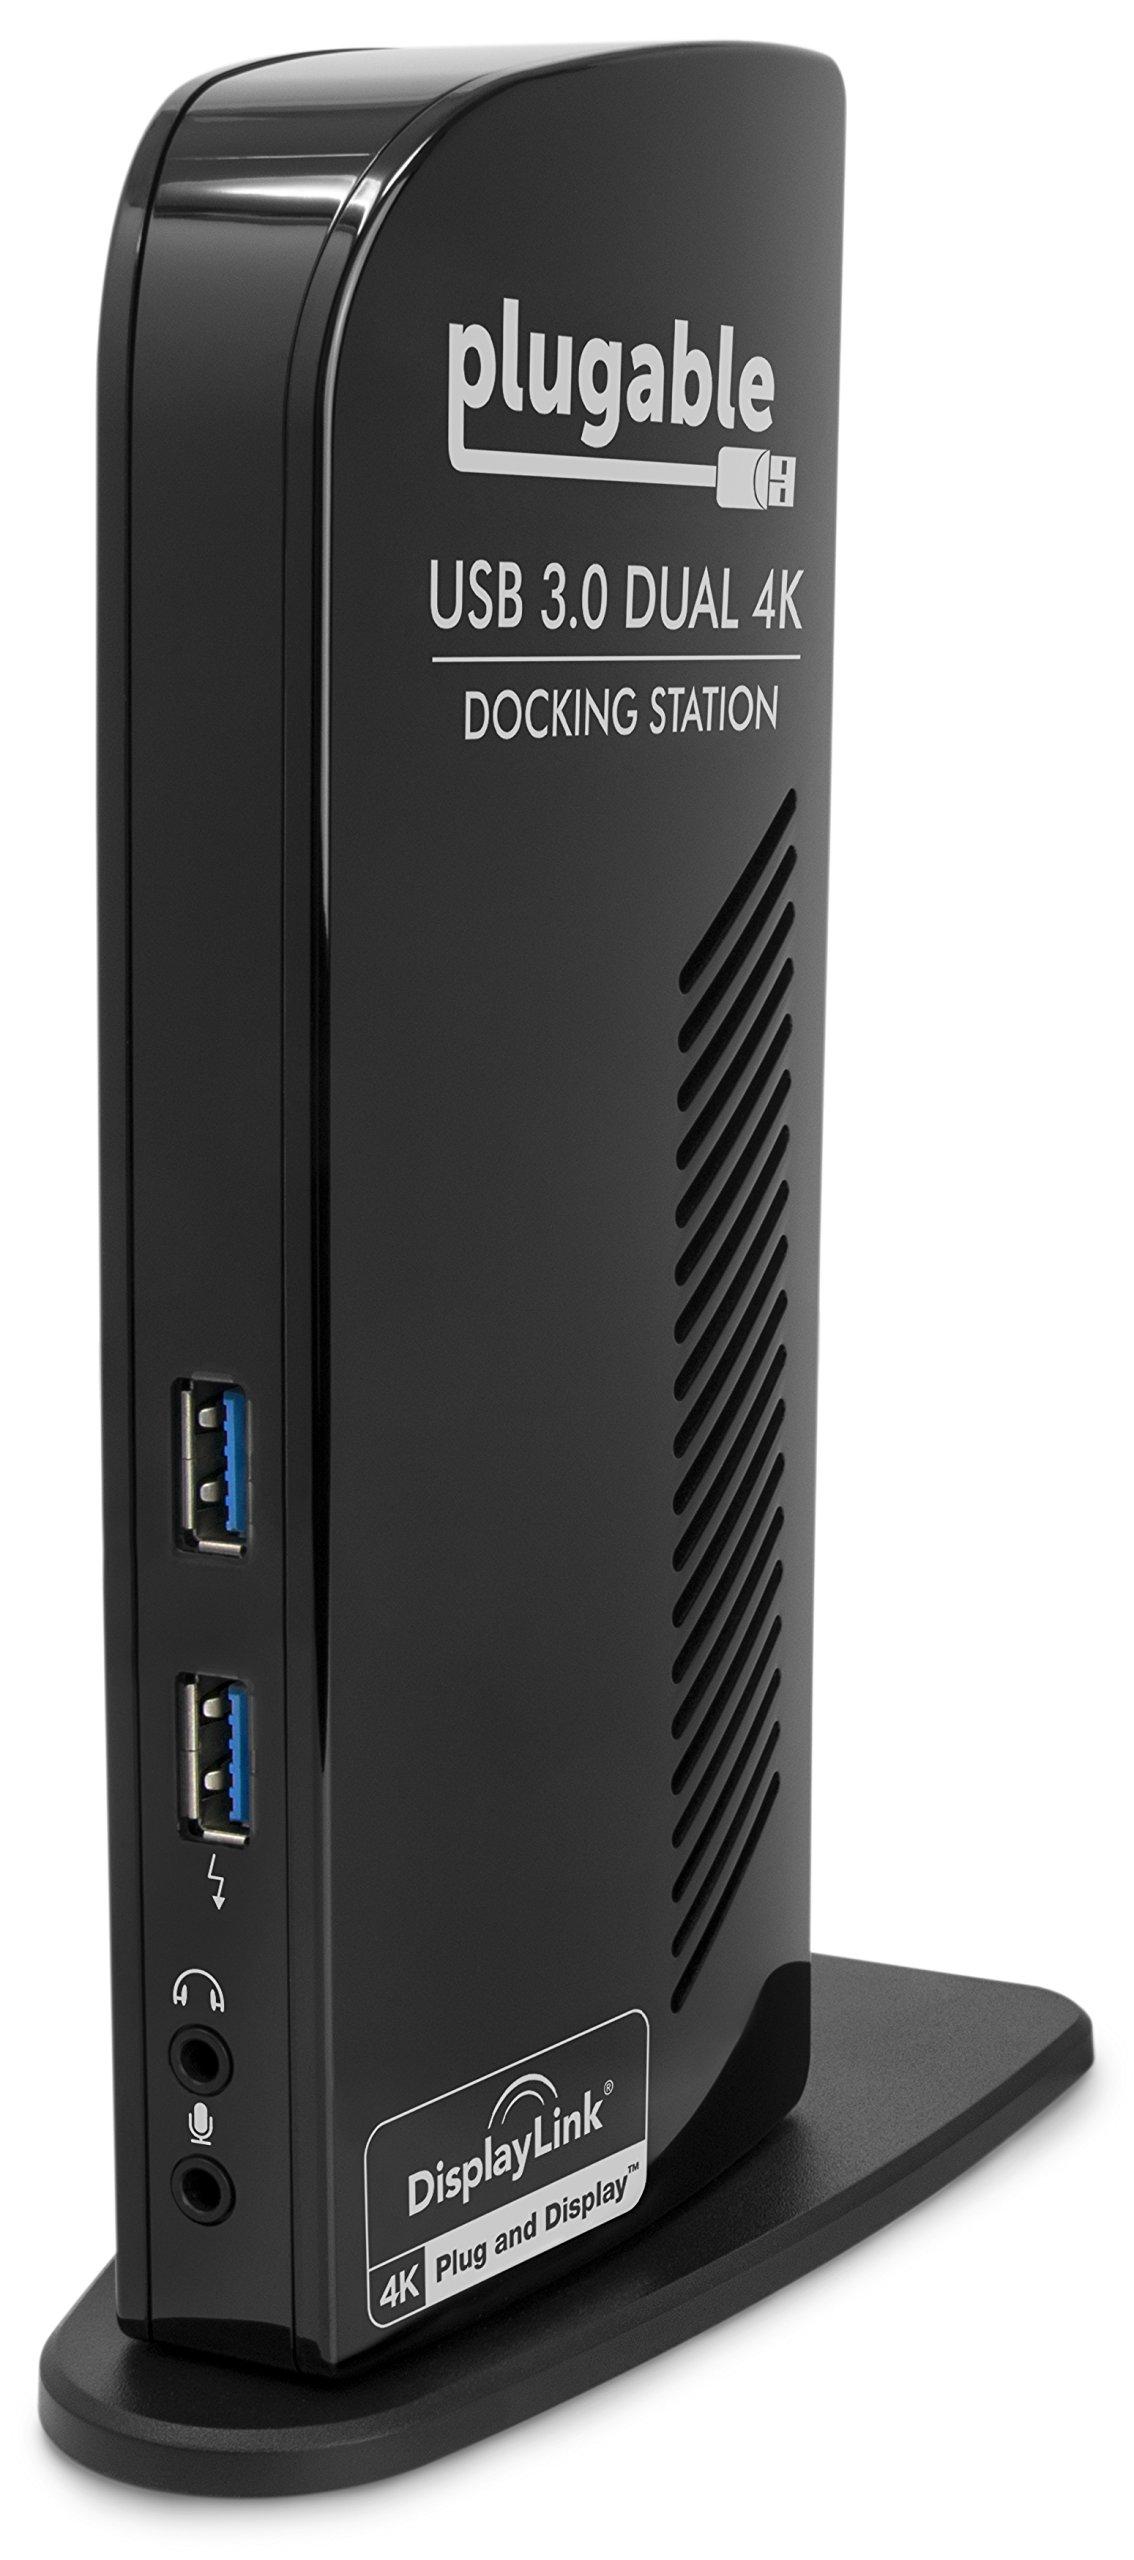 Plugable USB 3.0 Dual DisplayPort 4K Monitor Universal Laptop Docking Station for Windows (Dual 4K DisplayPort, Gigabit Ethernet, Audio, 6 USB Ports)